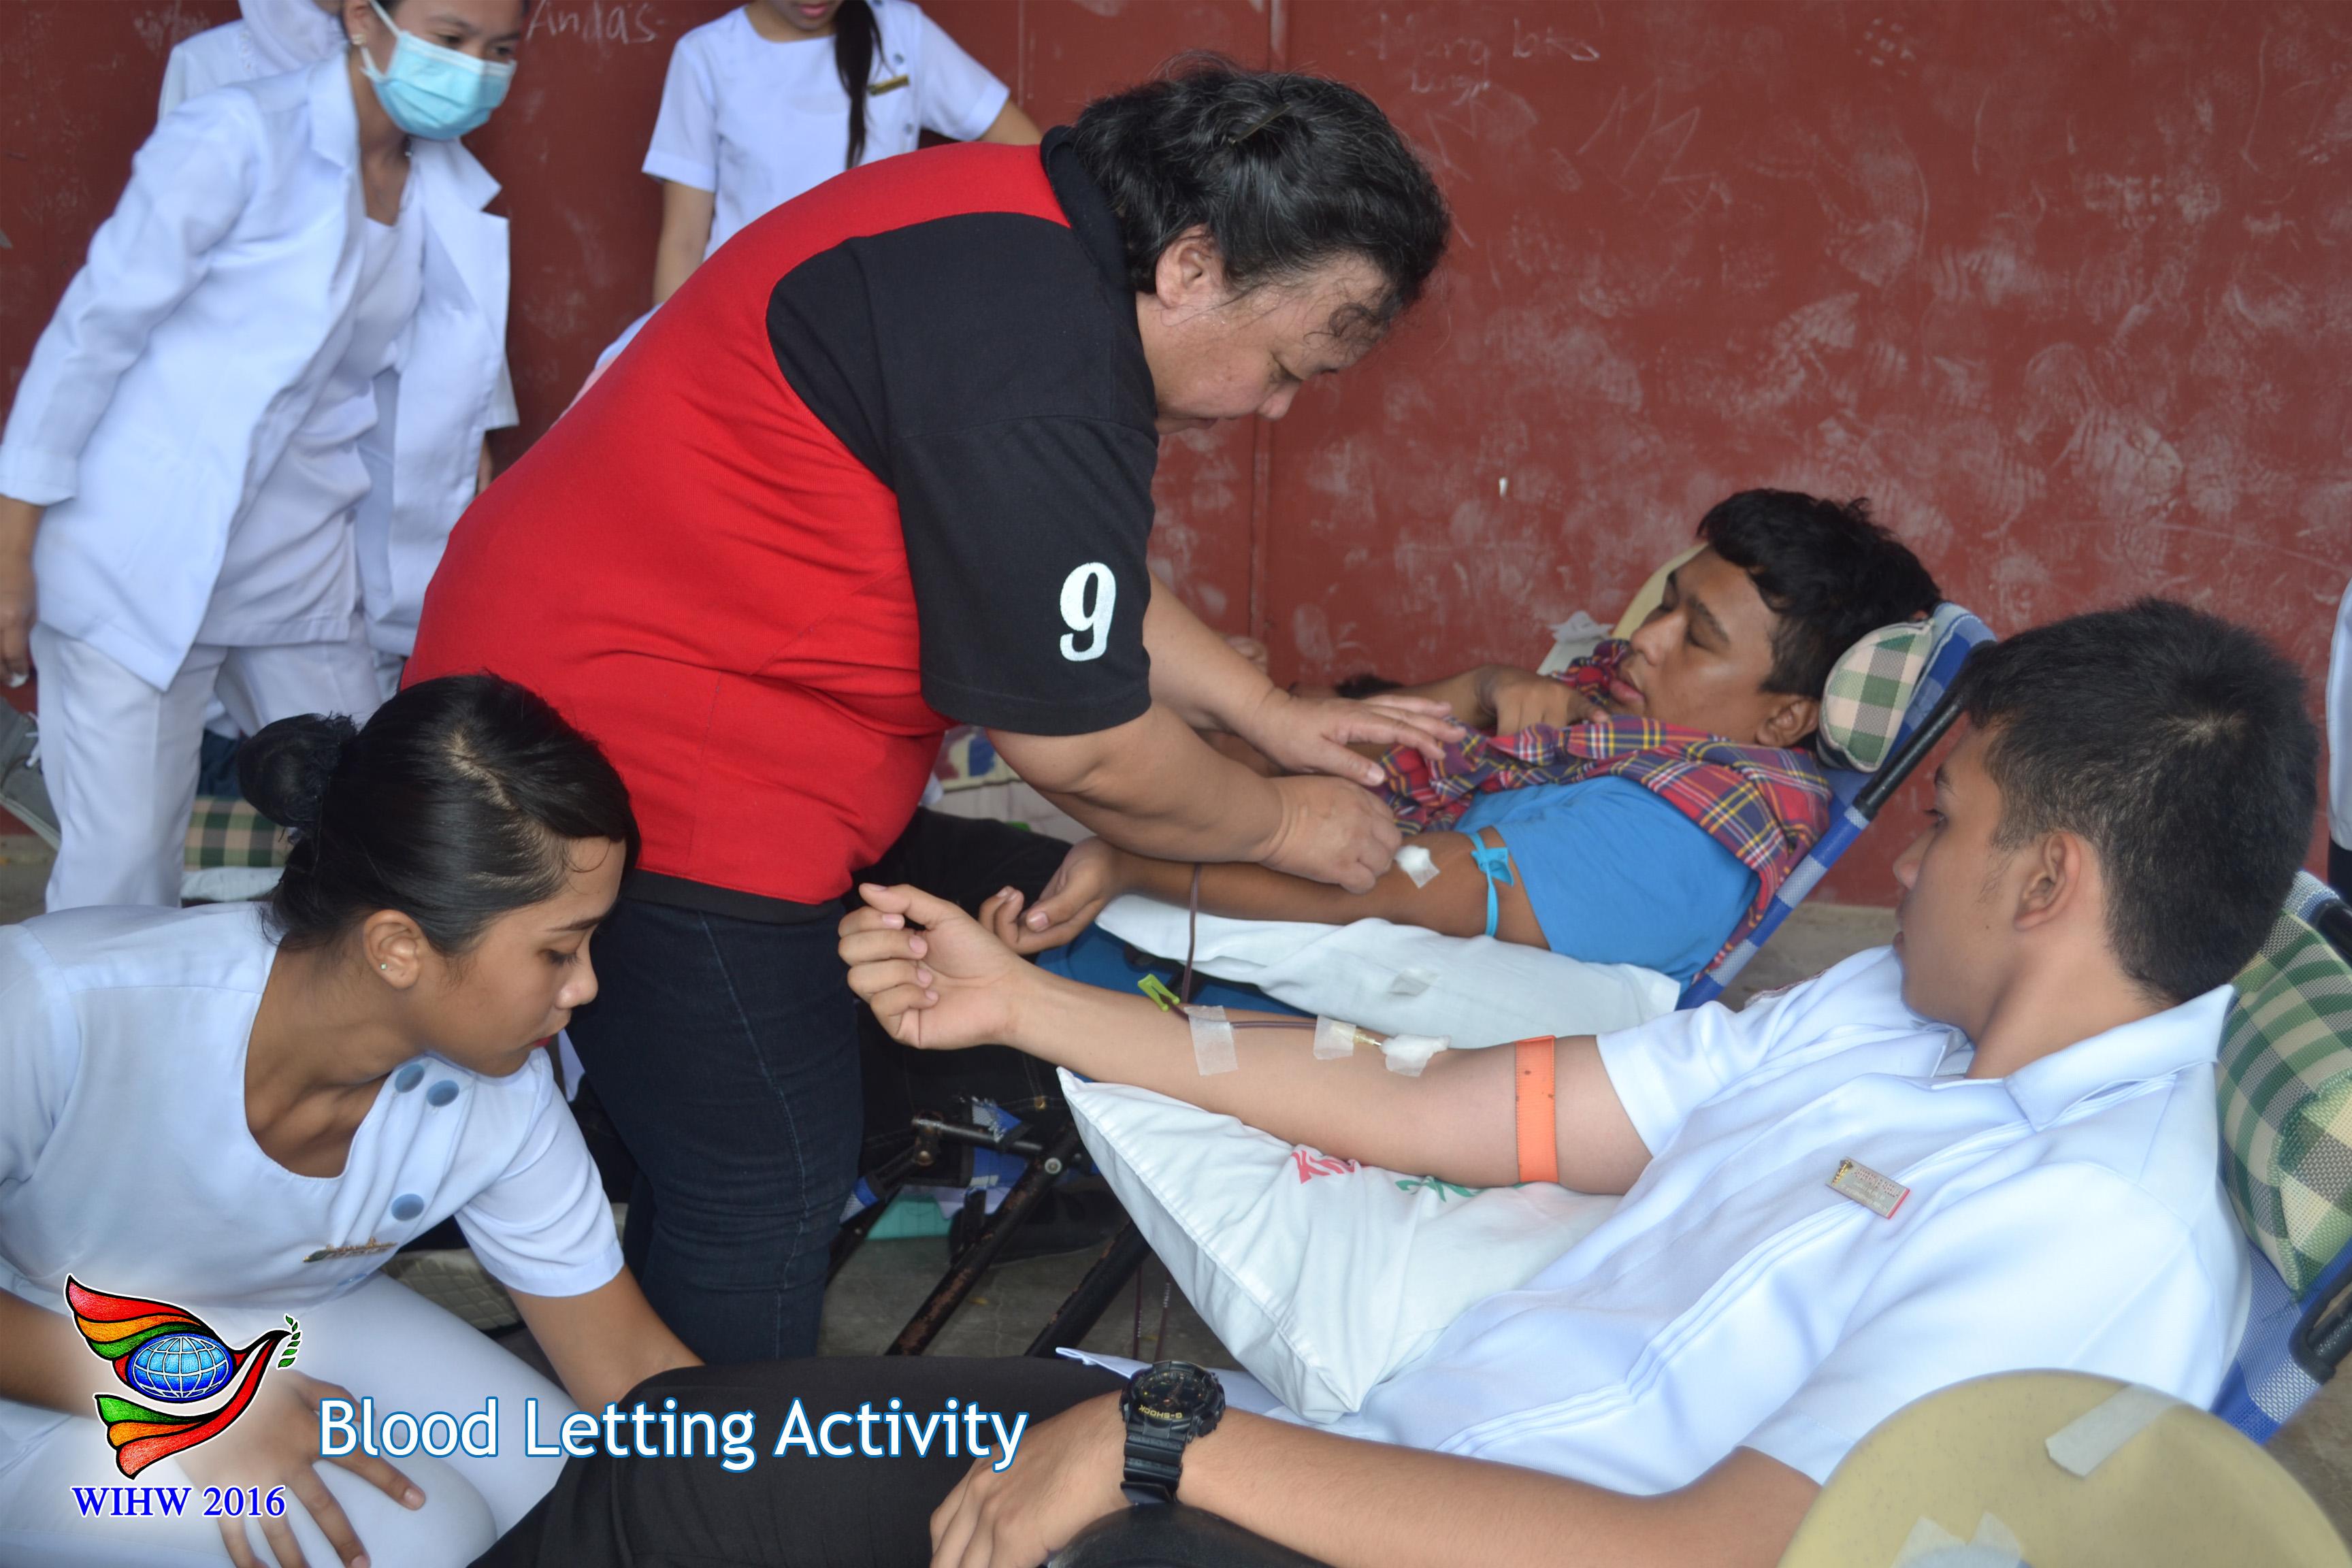 bloodletting2.jpg